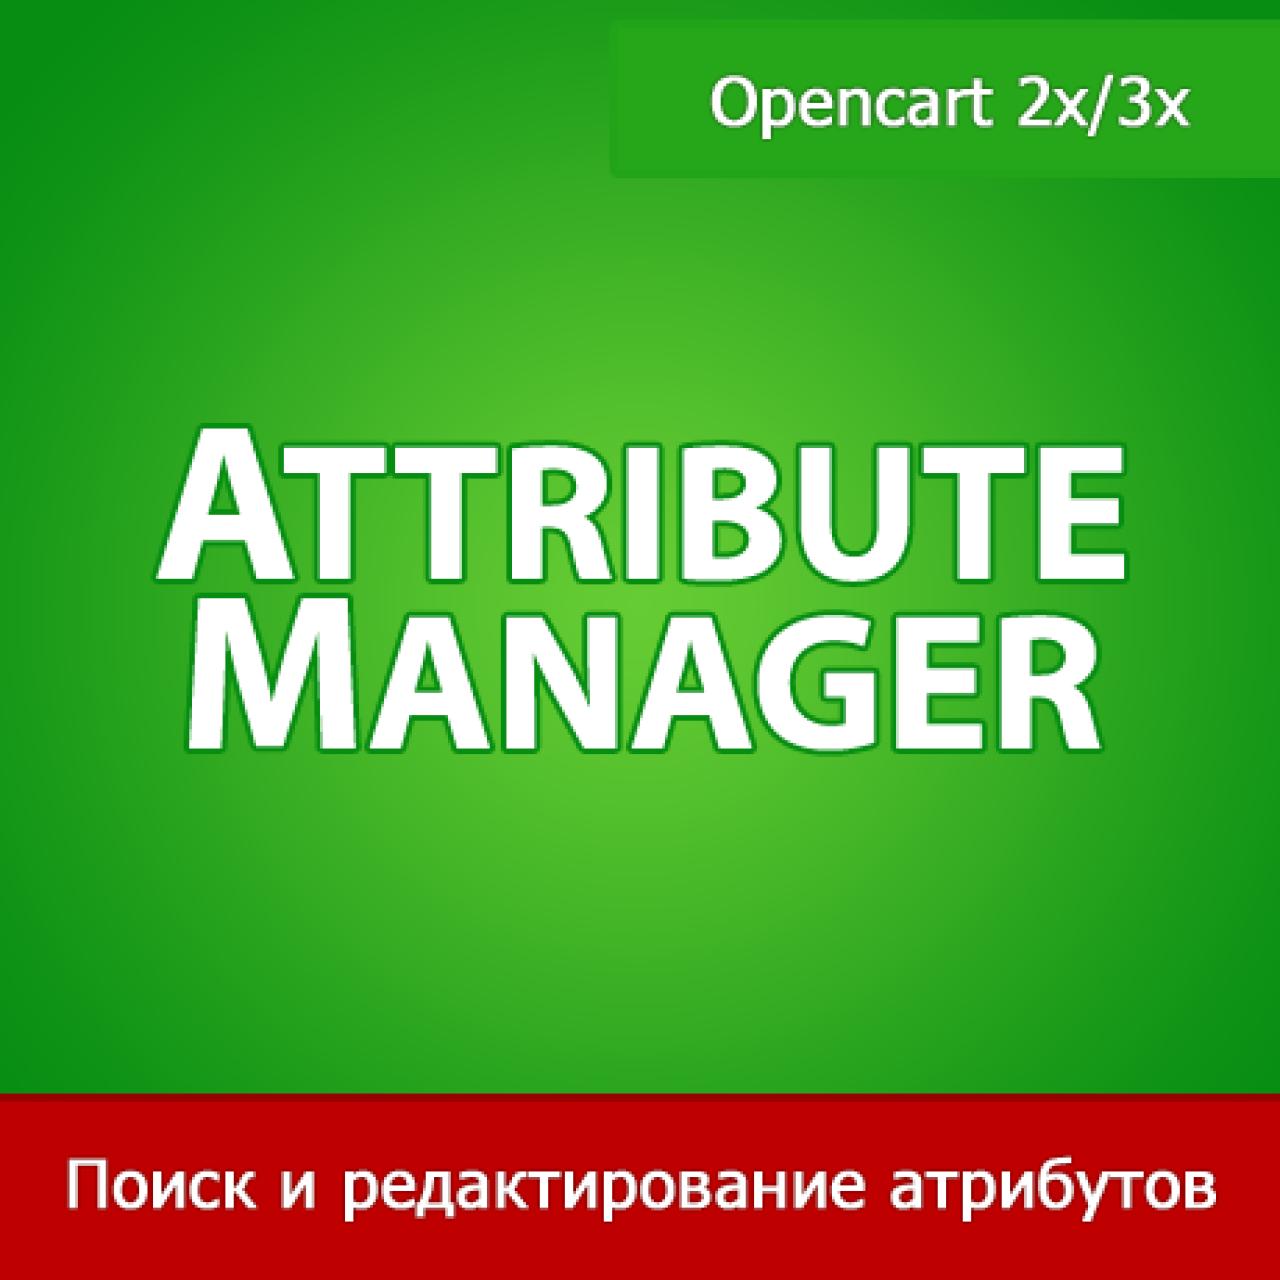 Attribute Manager - управление атрибутами / характеристиками из категории Админка для CMS OpenCart (ОпенКарт)